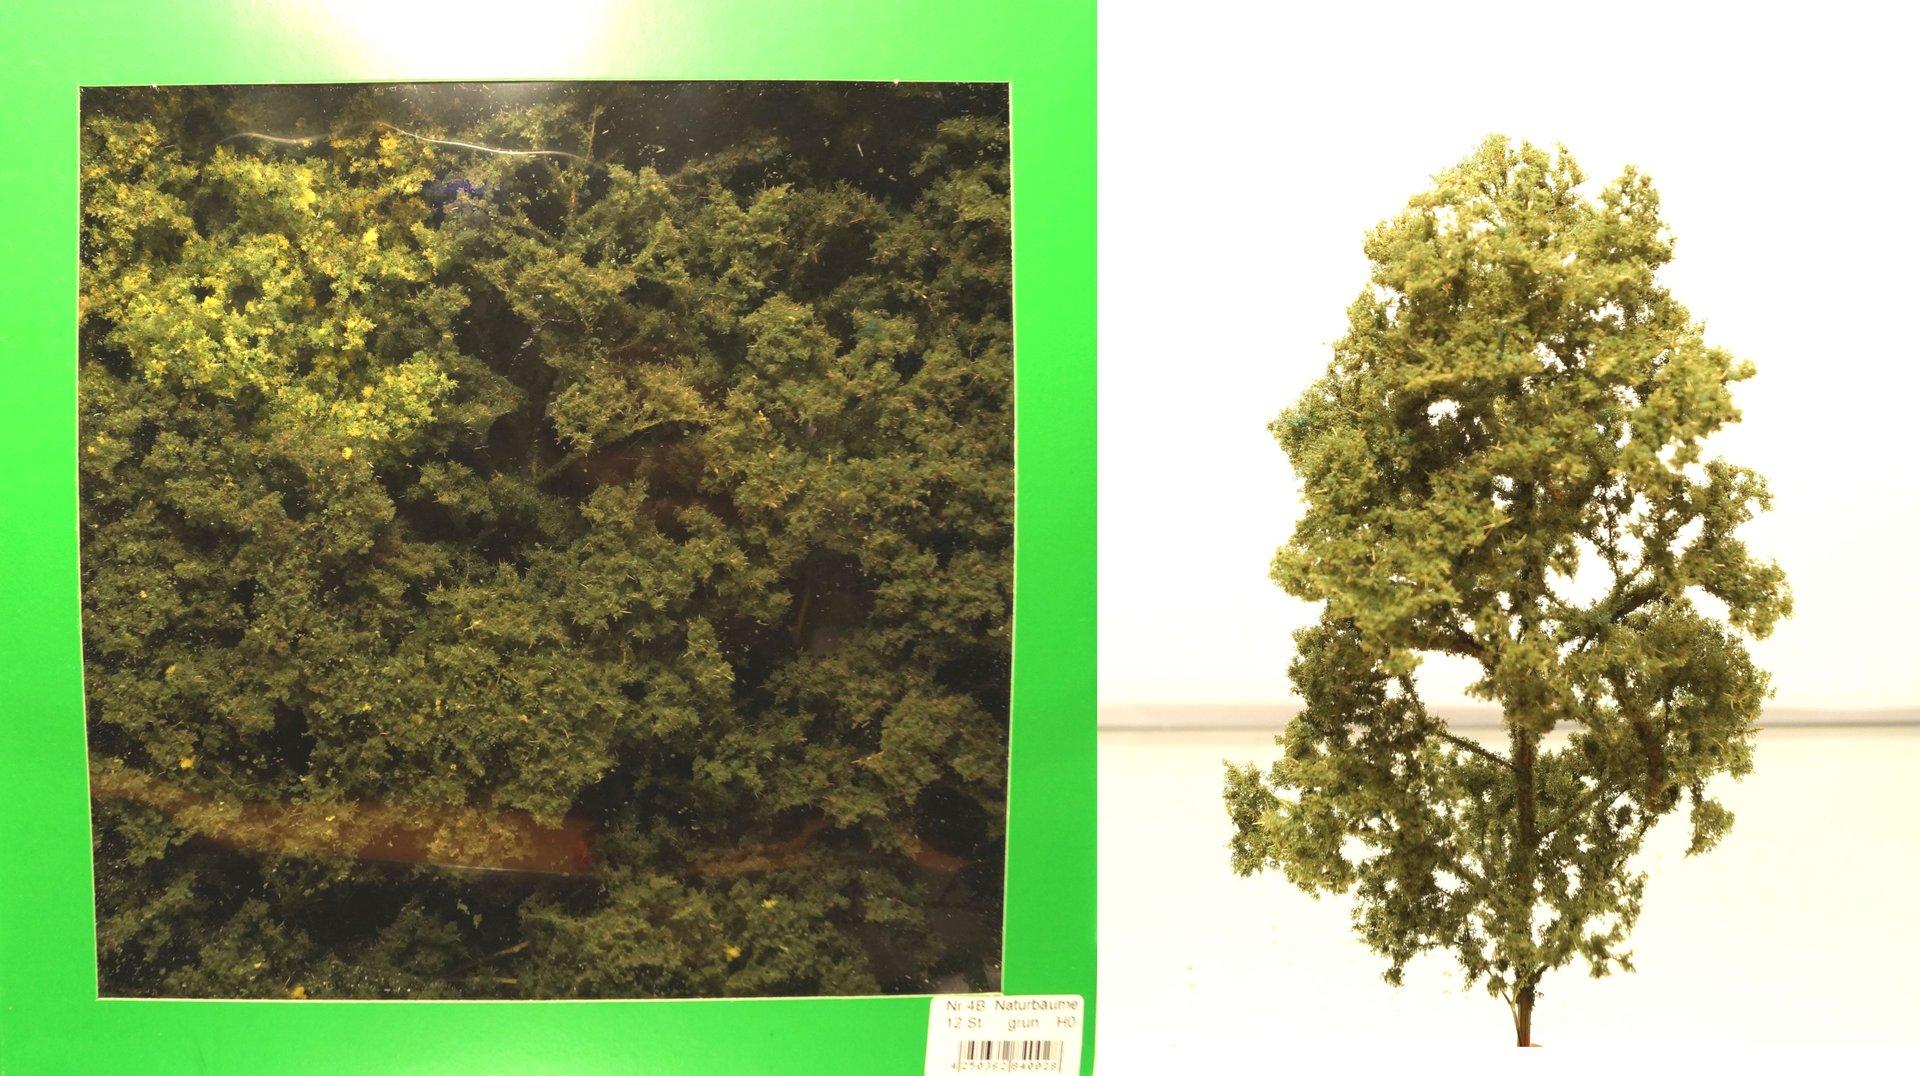 Natur-Laubbäume in Herbstfarben 8-12cm 12 Stück Modell Spur H0 // N Jordan 4C